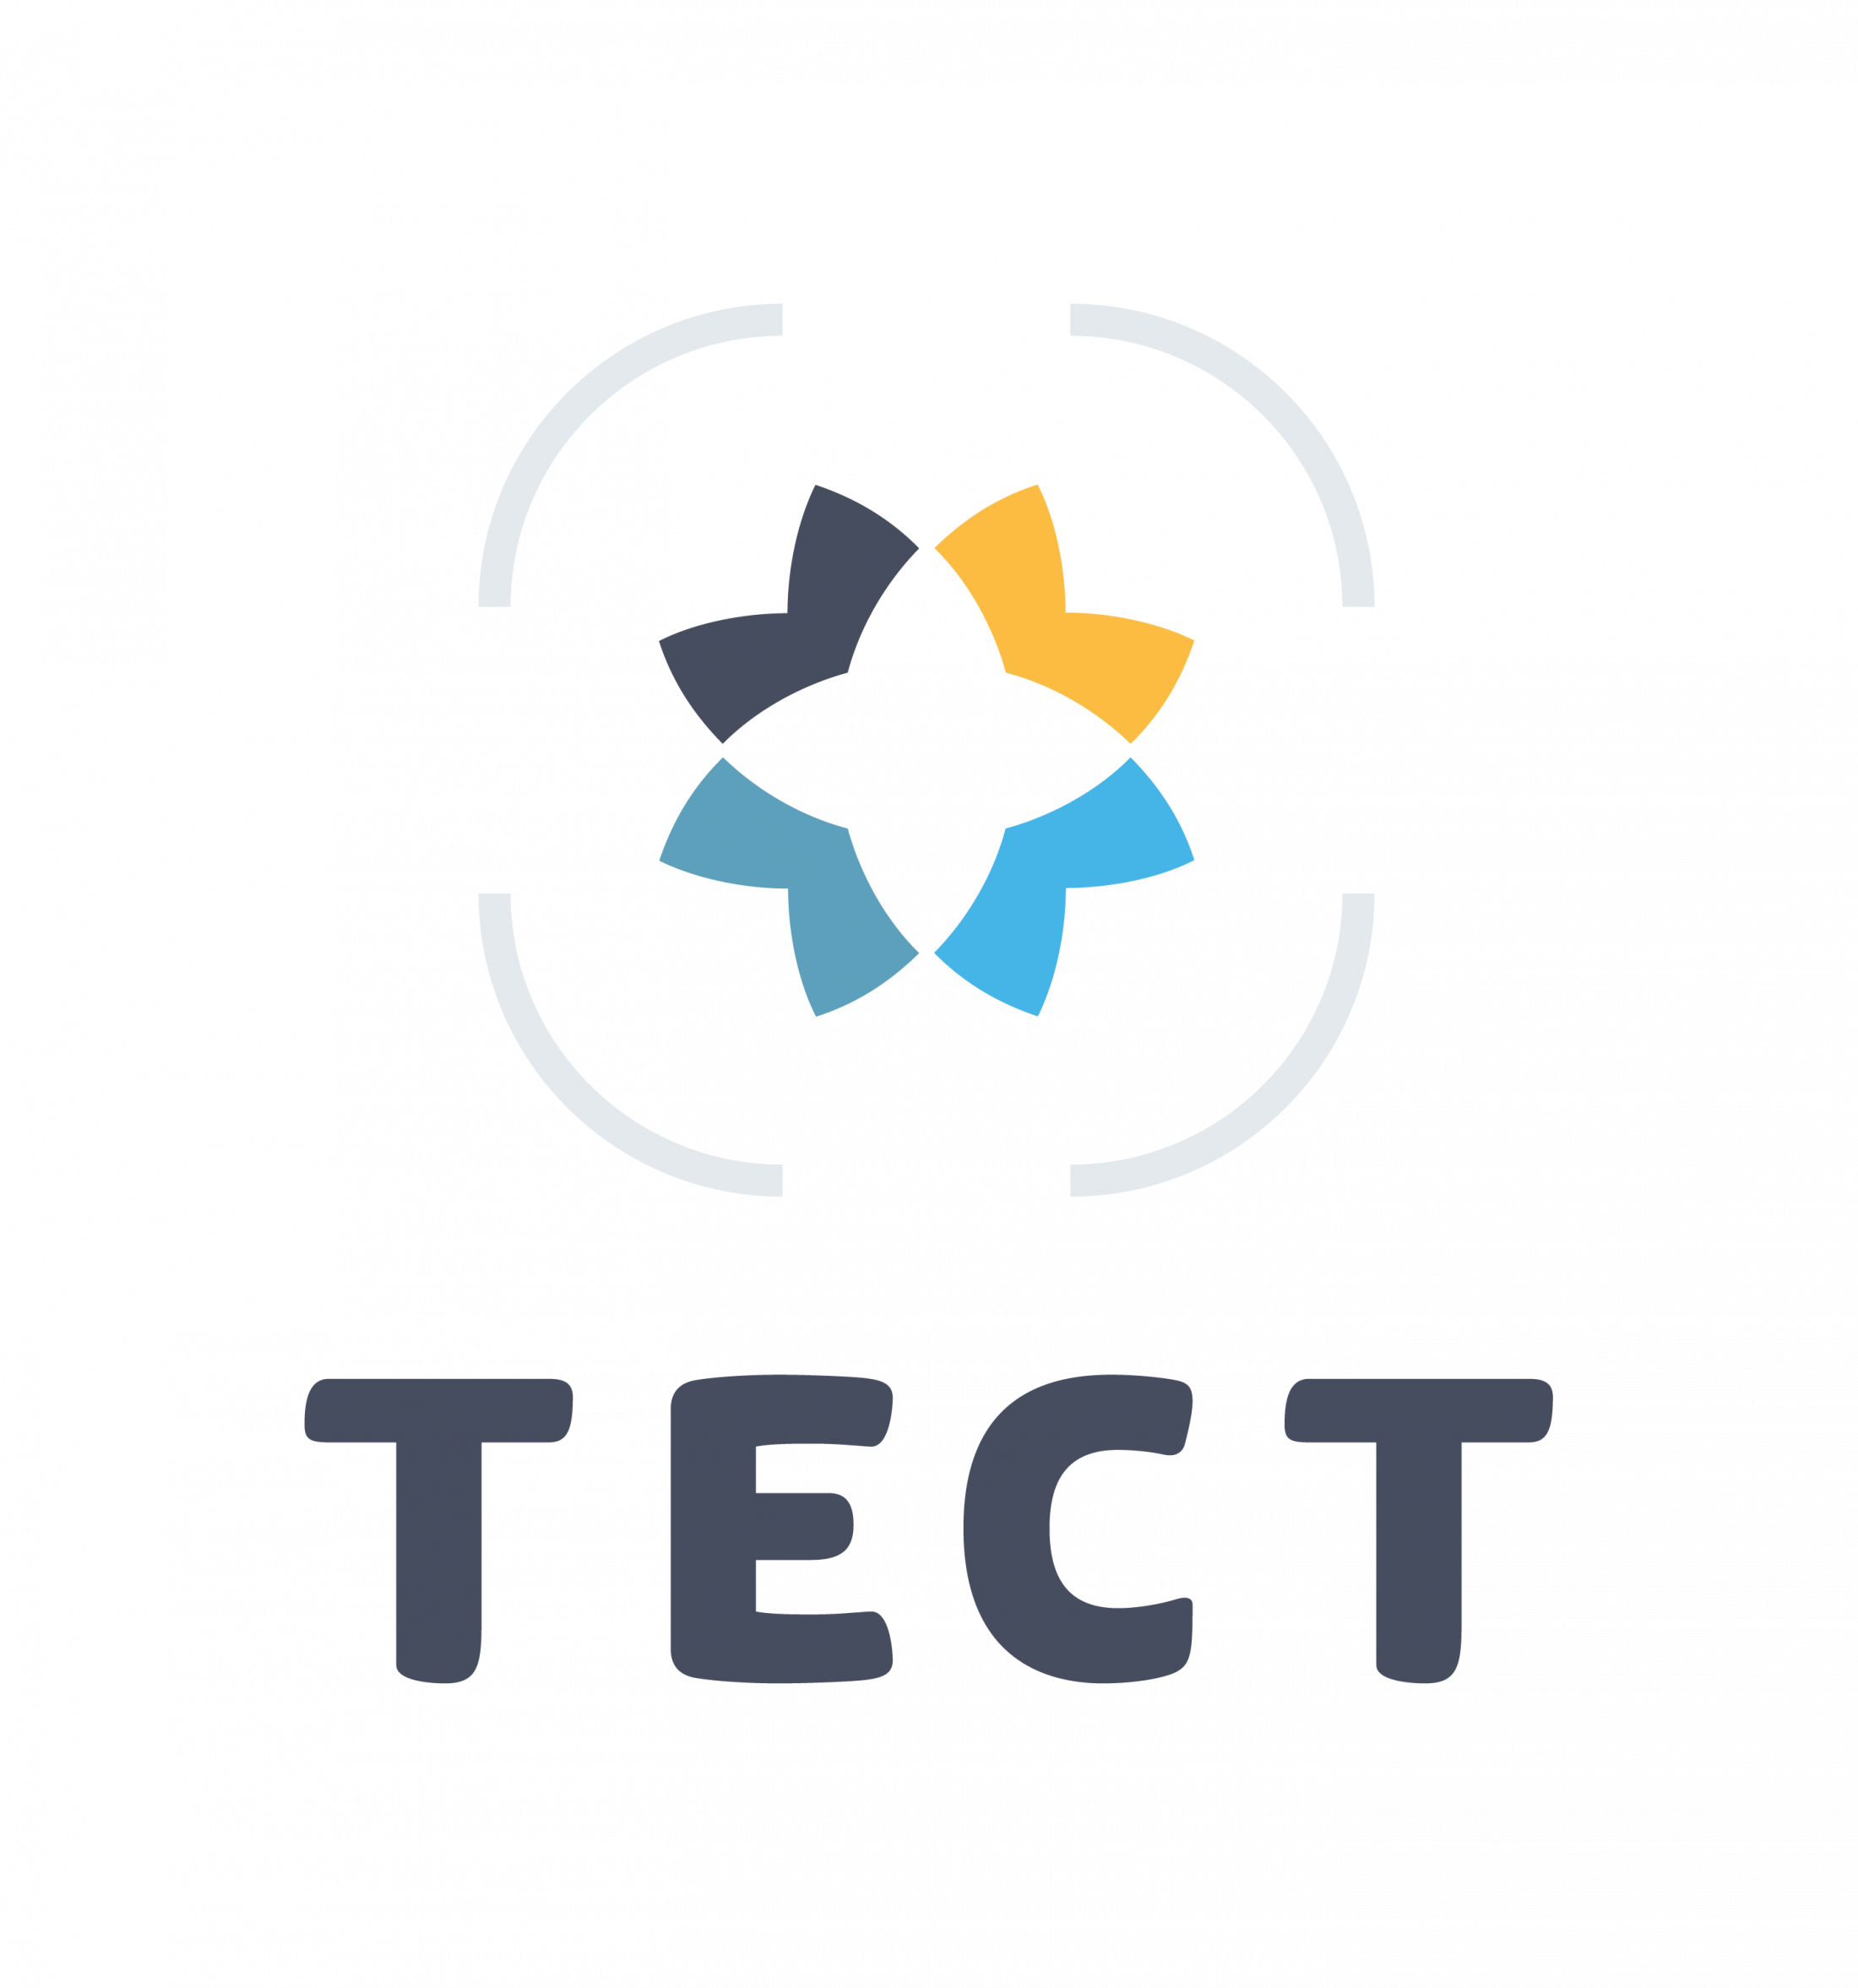 Tect Brandmark [stacked Rgb] 01